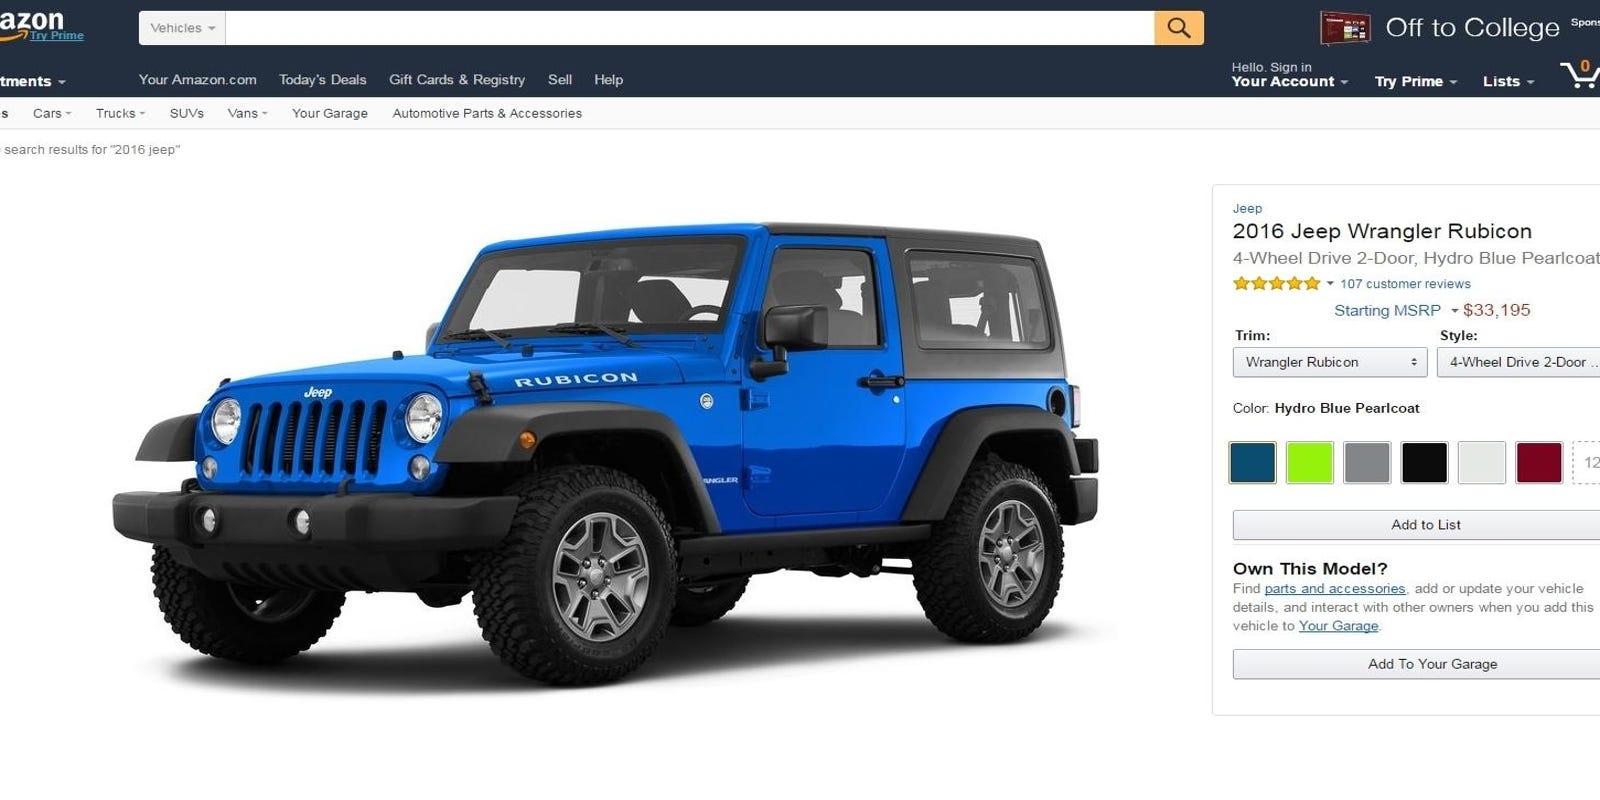 Online Car Sales >> Amazon Takes A Step Toward Possible Online Car Sales